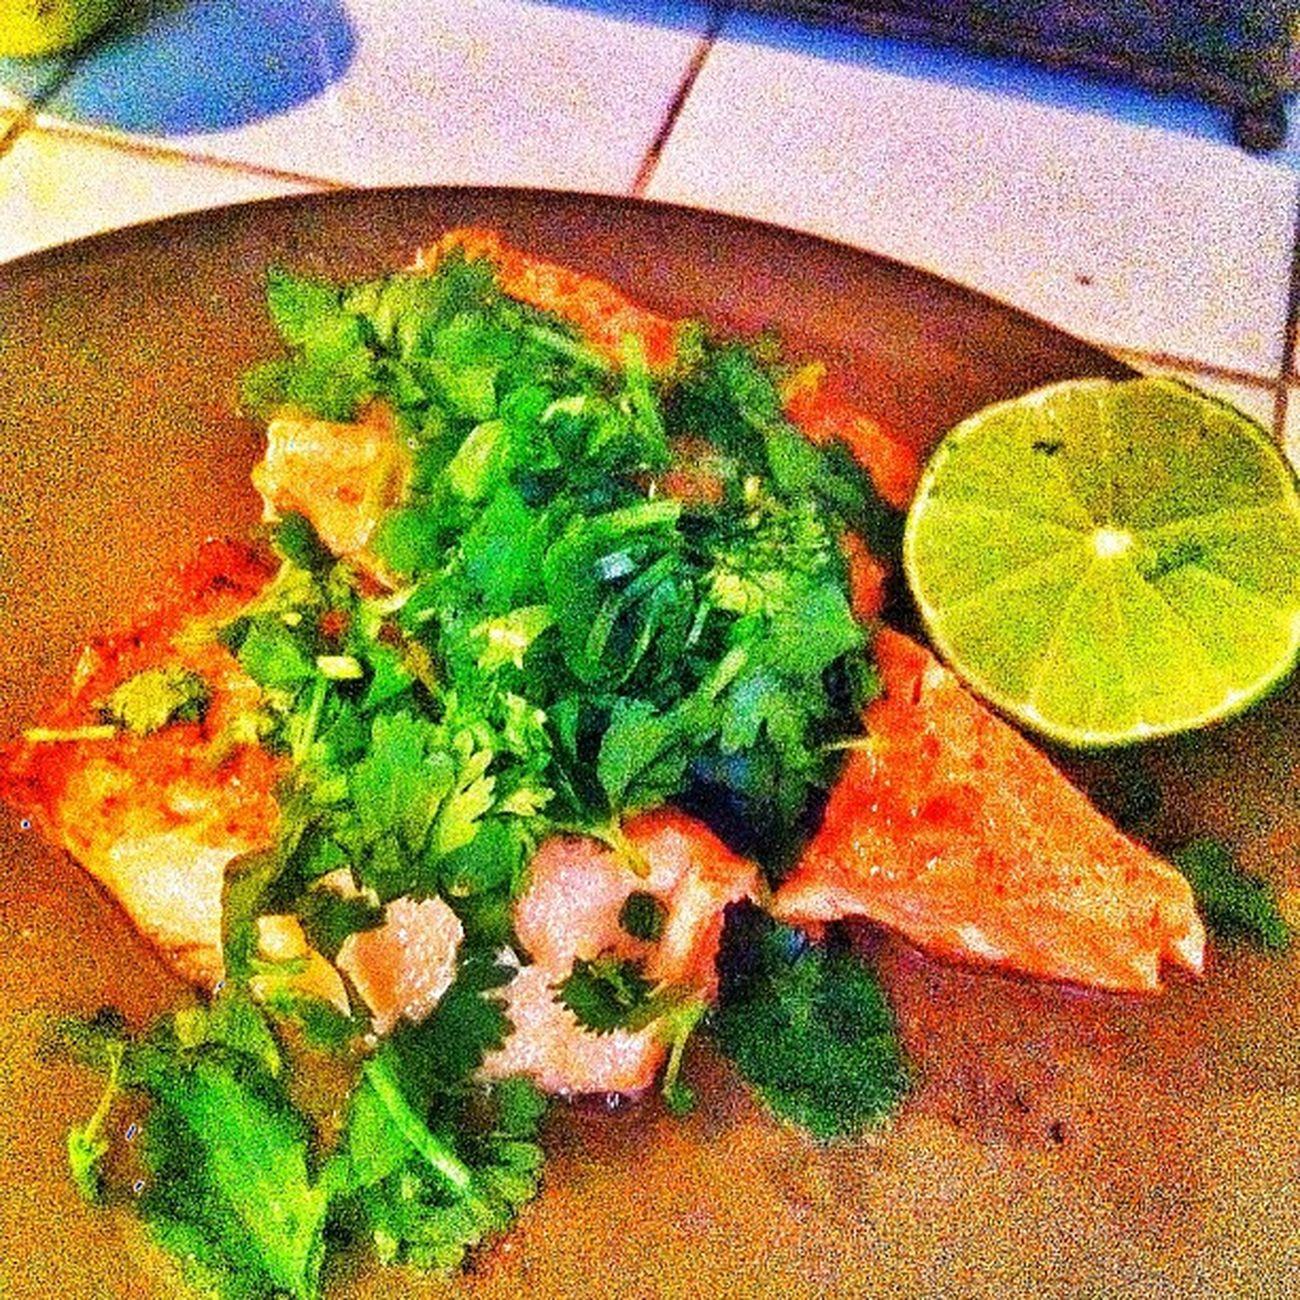 Almost done with my lunch ? Salmon Cylarndro Lemon Rice saladlowfatdressinghealthylivingstayingmotivatedhighlife